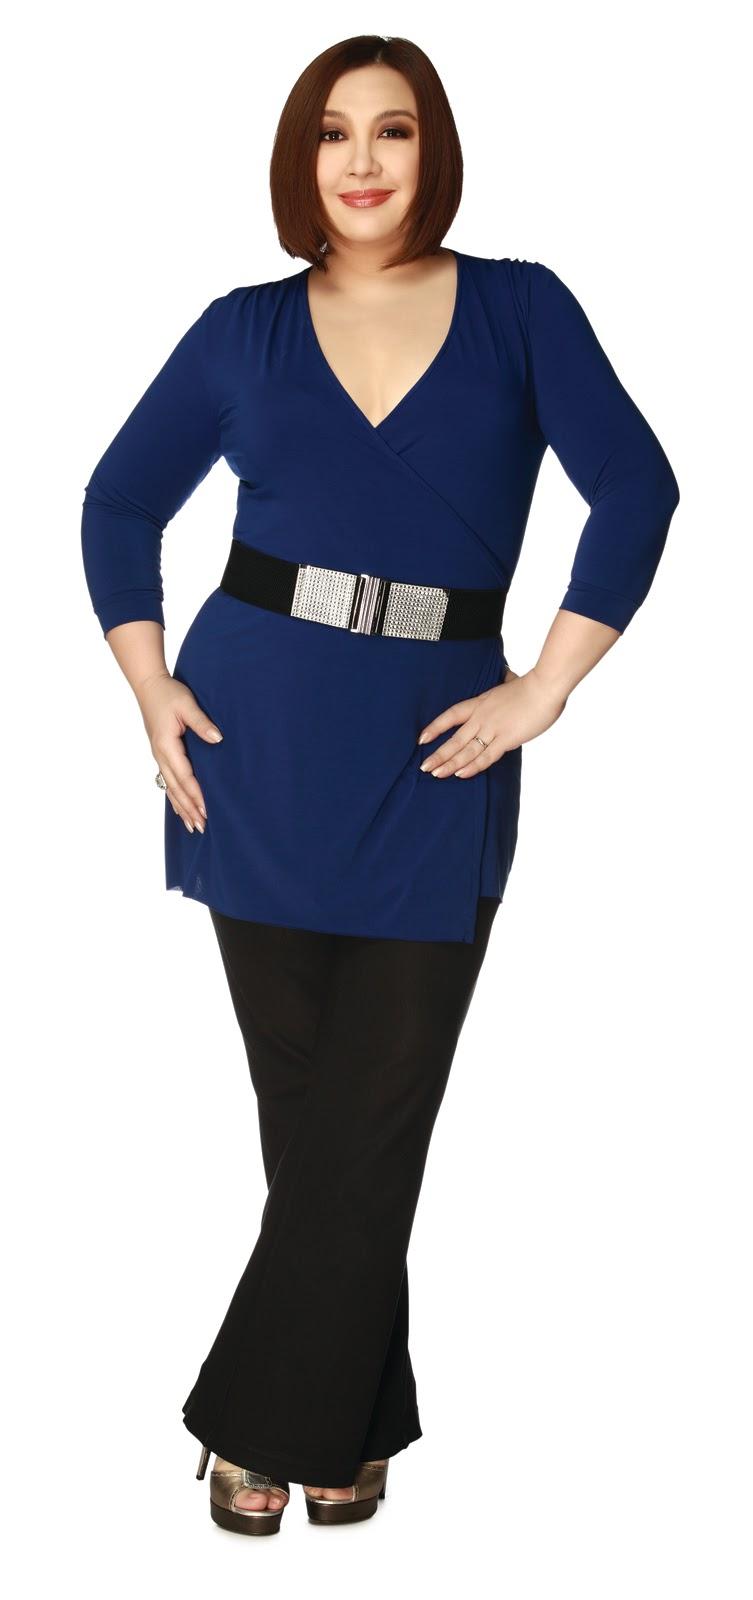 sharon cuneta weight loss